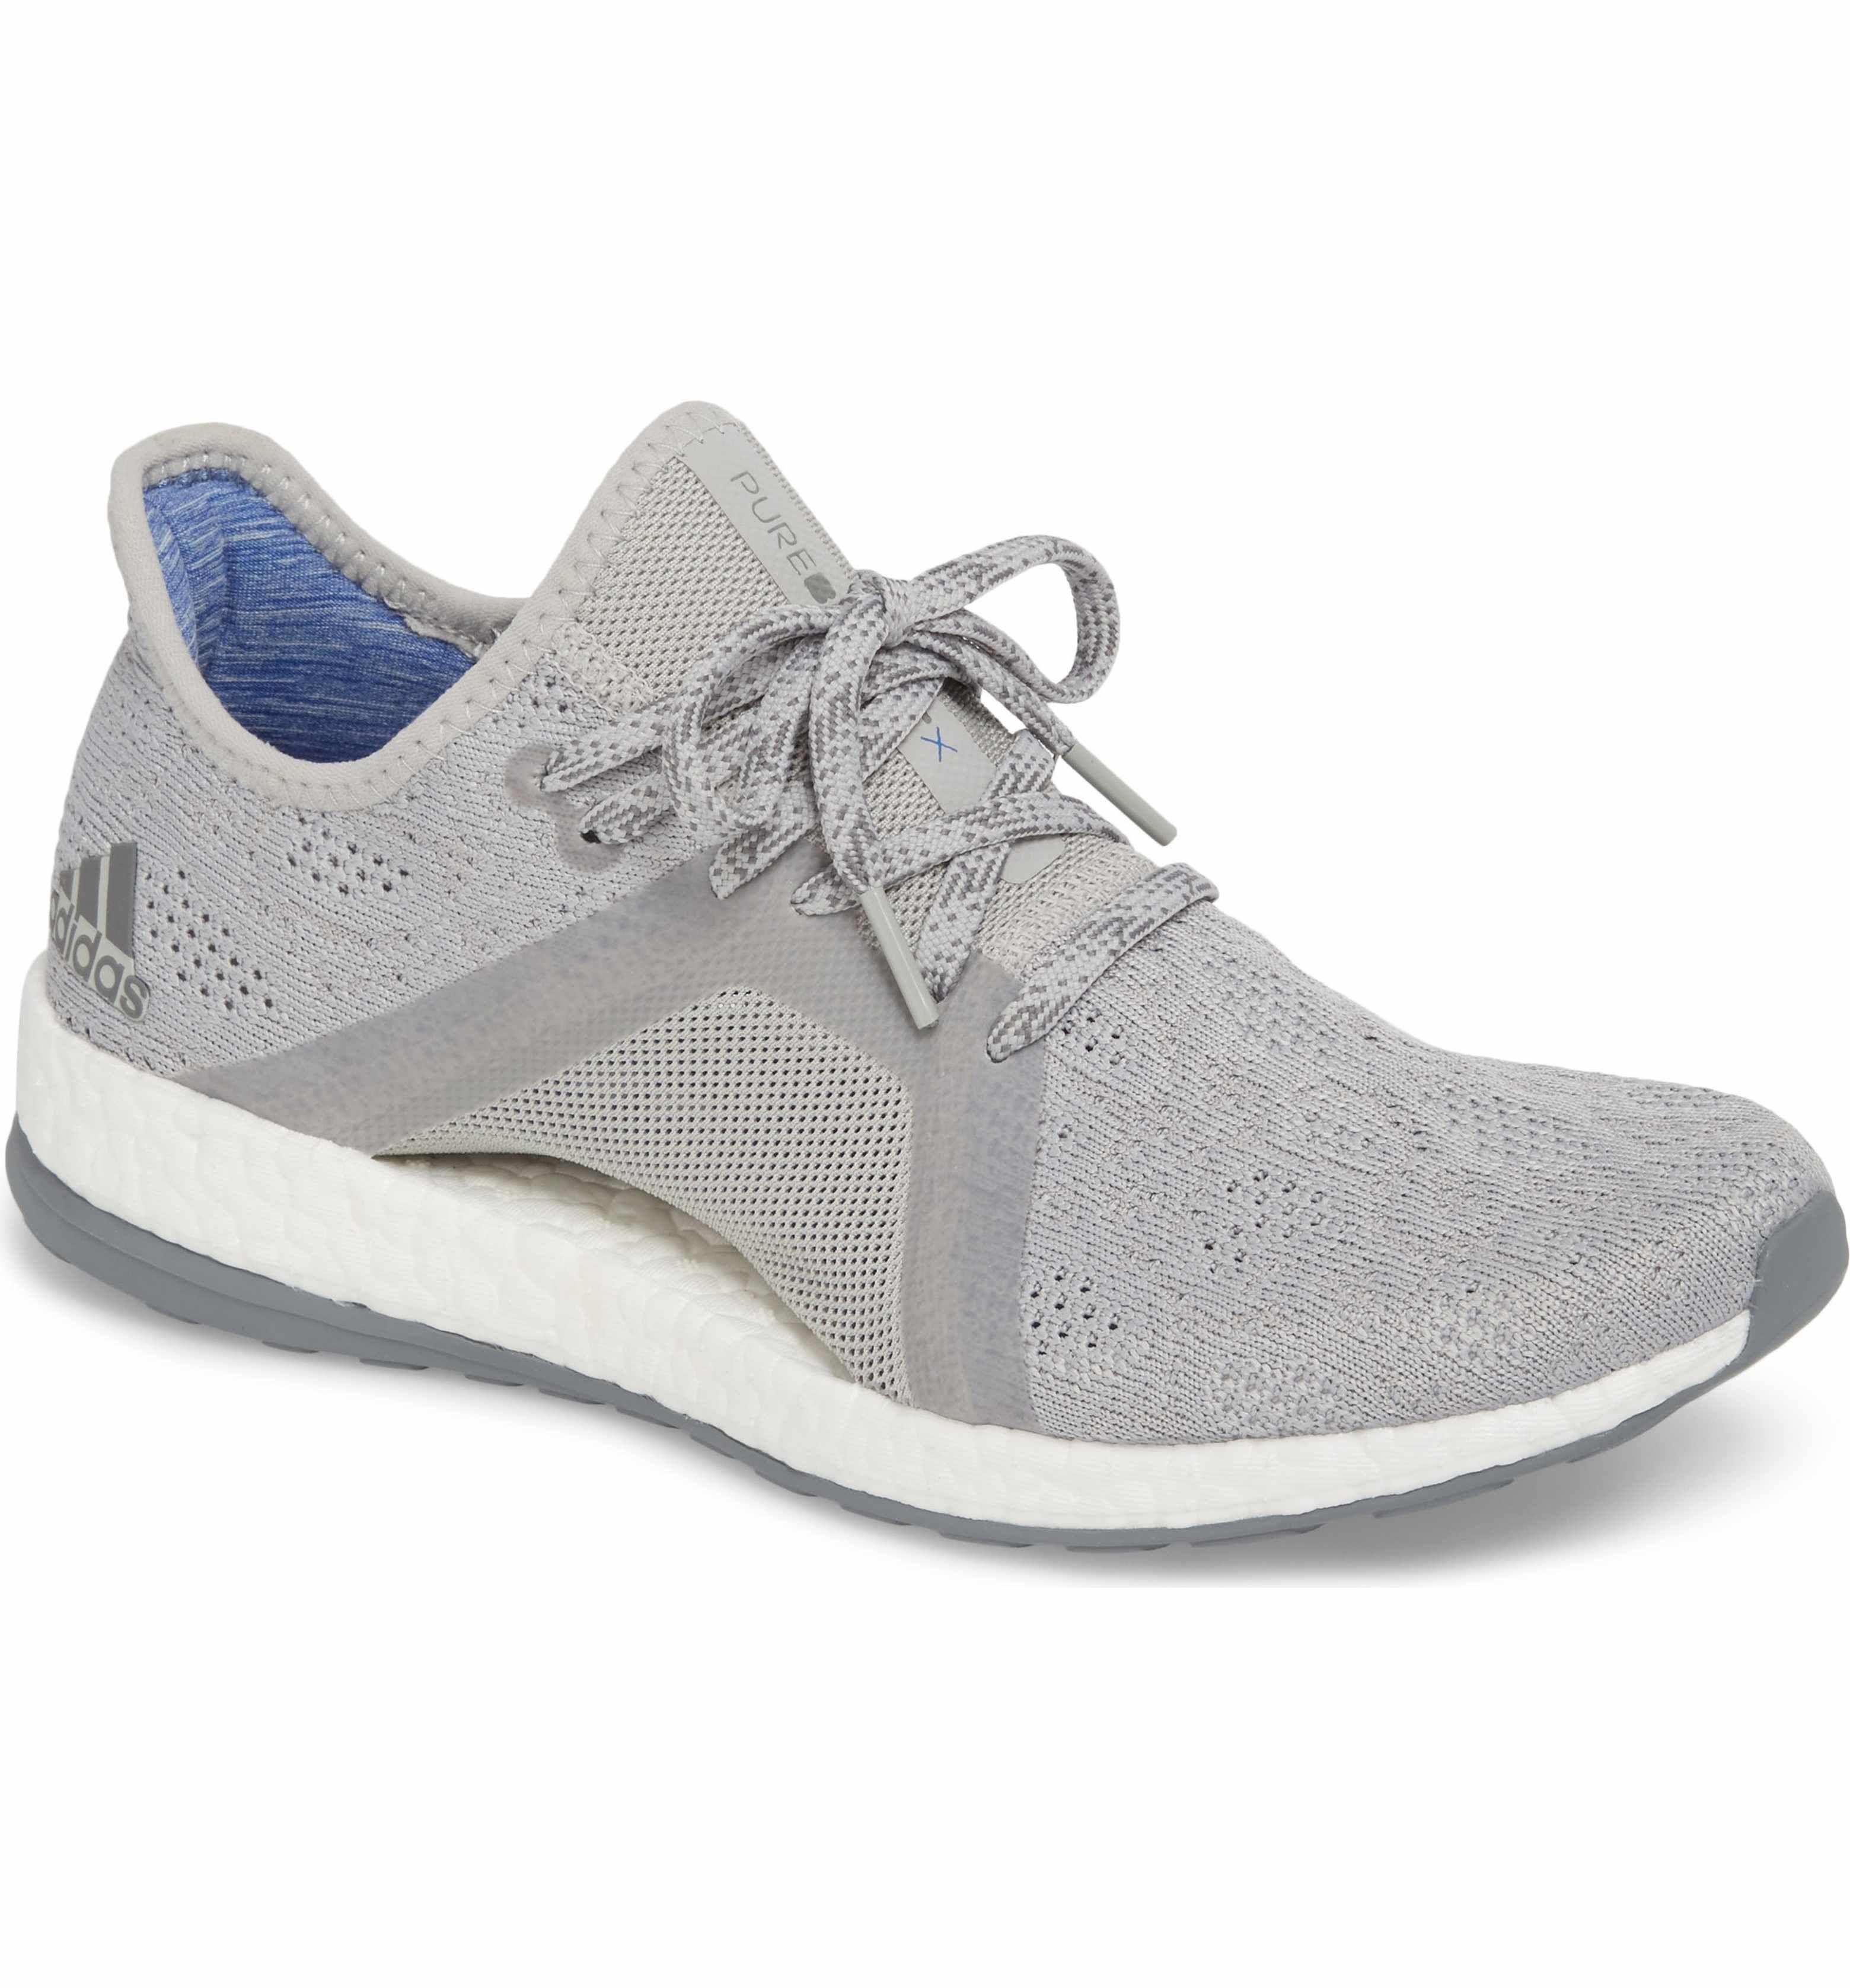 Main Image Adidas Pureboost X Element Knit Running Shoe Women Adidas Pure Boost Cross Training Shoes Womens Running Shoes